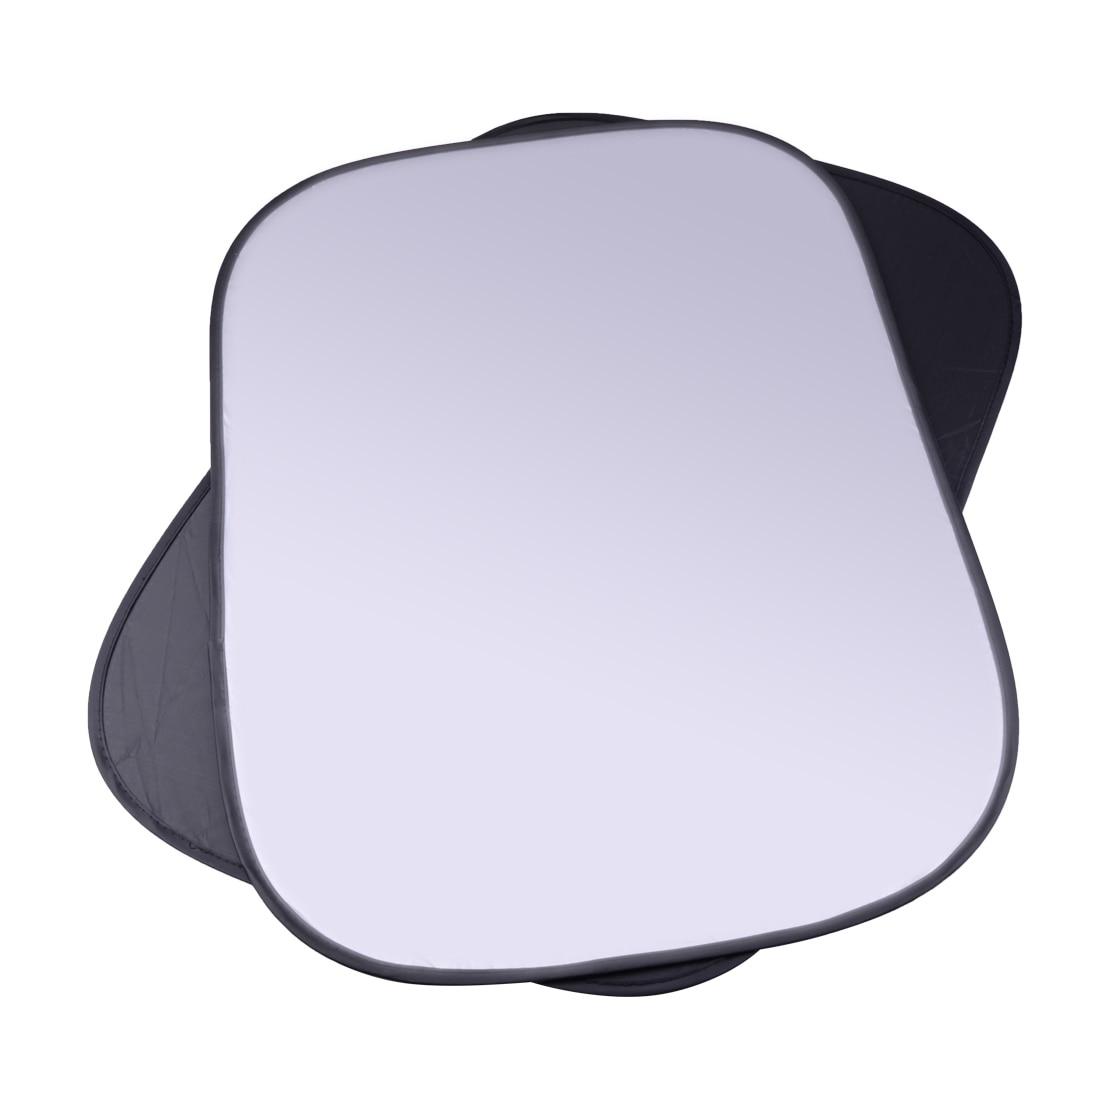 Citall 2 pçs dobrável pára-sol sombra uv proteger o calor isolar para mini cooper f54 f55 r55 f56 r56 r56 2007 - 2015 2016 2017